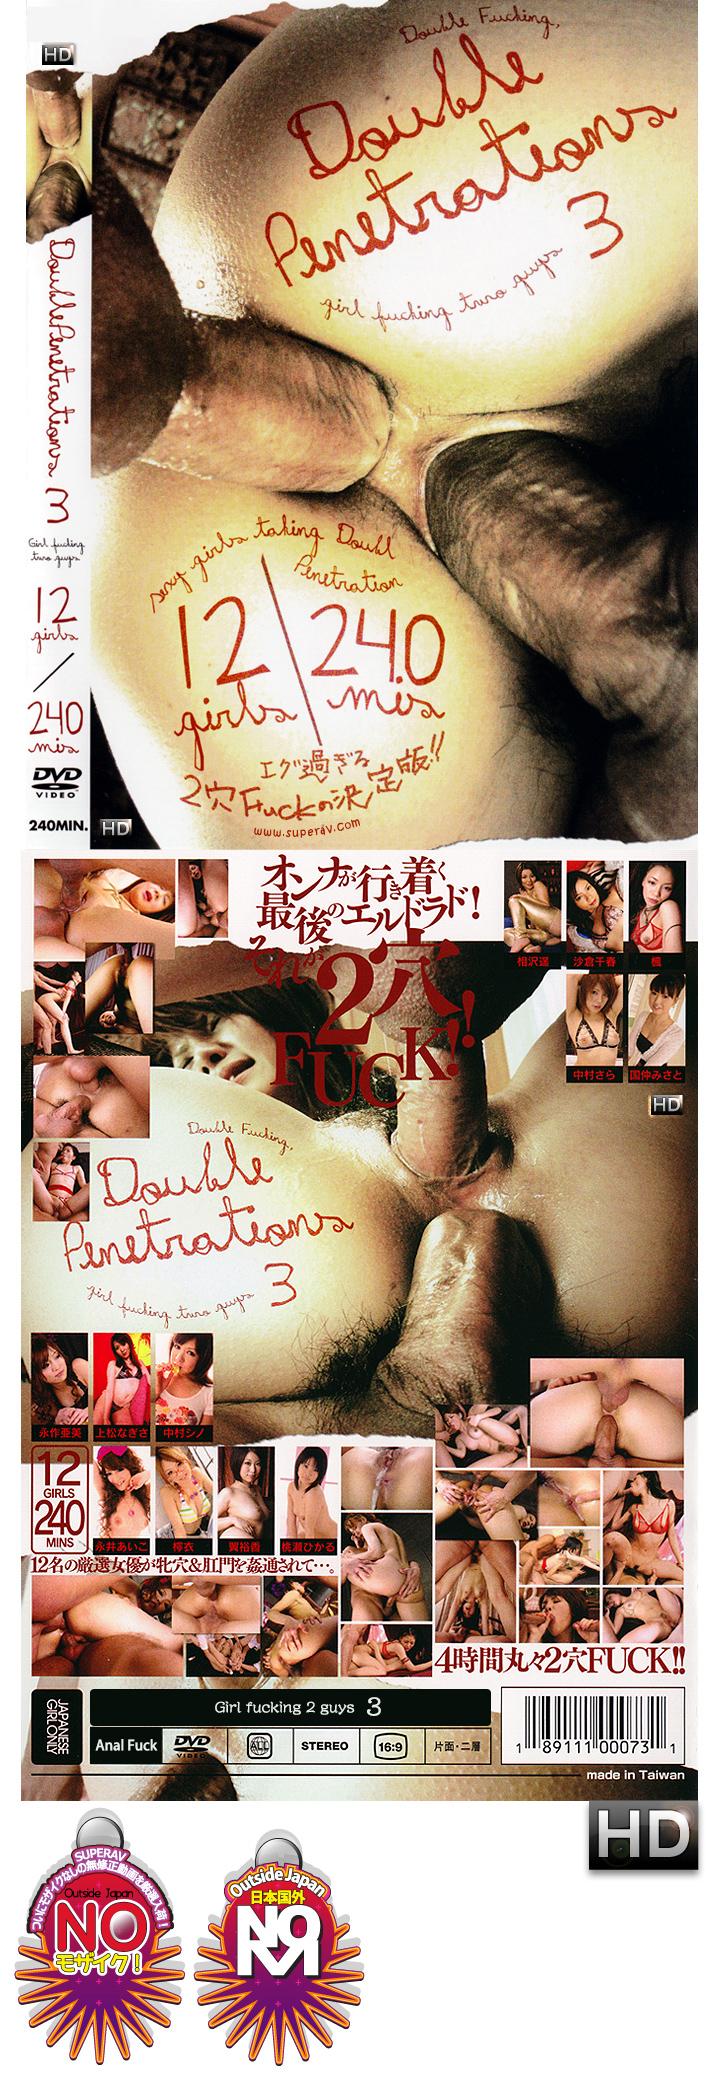 Asian ass girl doing a double penetration in Japan BG